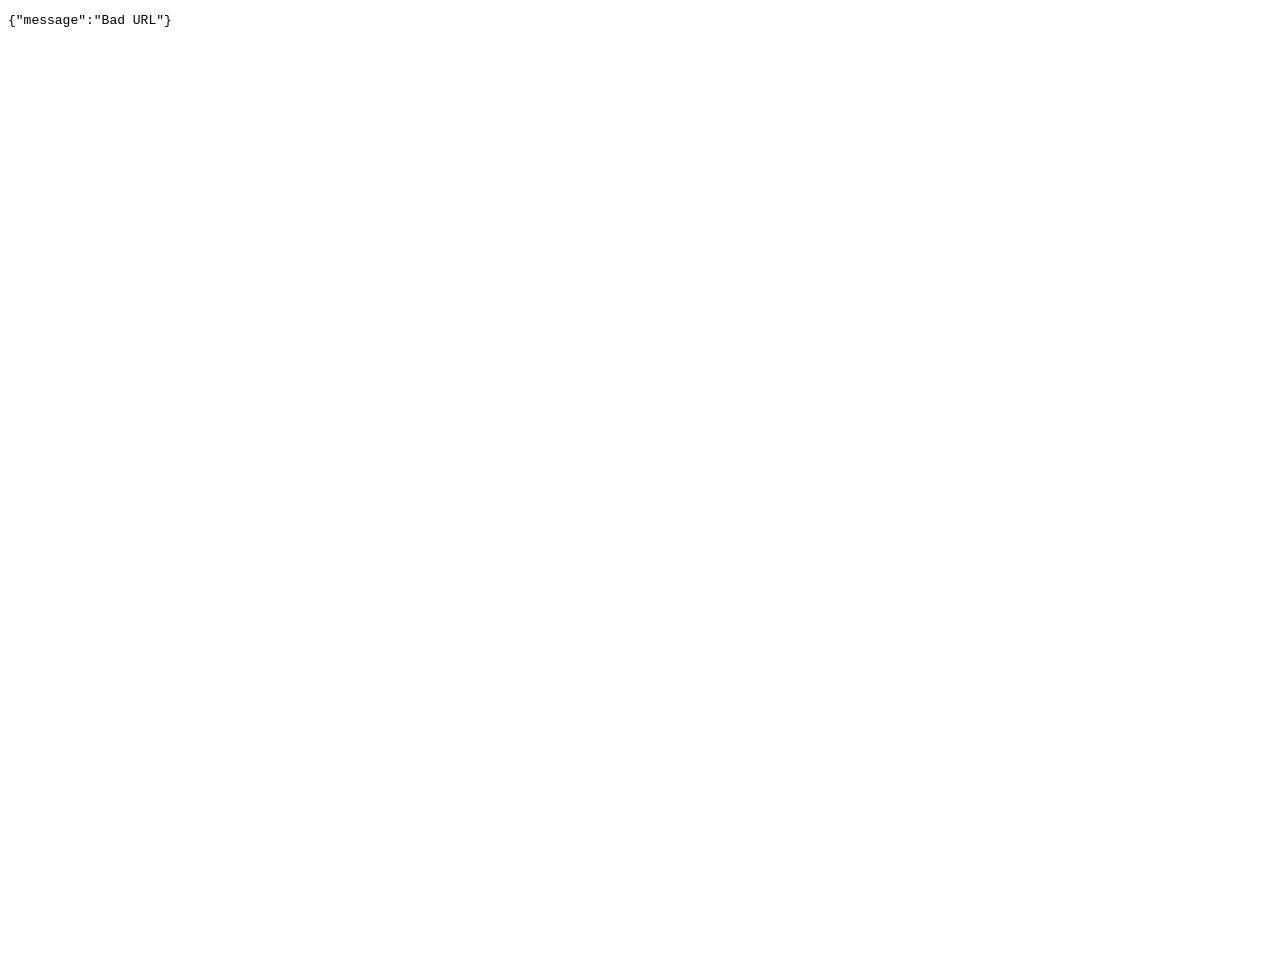 Thomas: 'I don't think I left my mark yet' – Pittsburgh Steelers